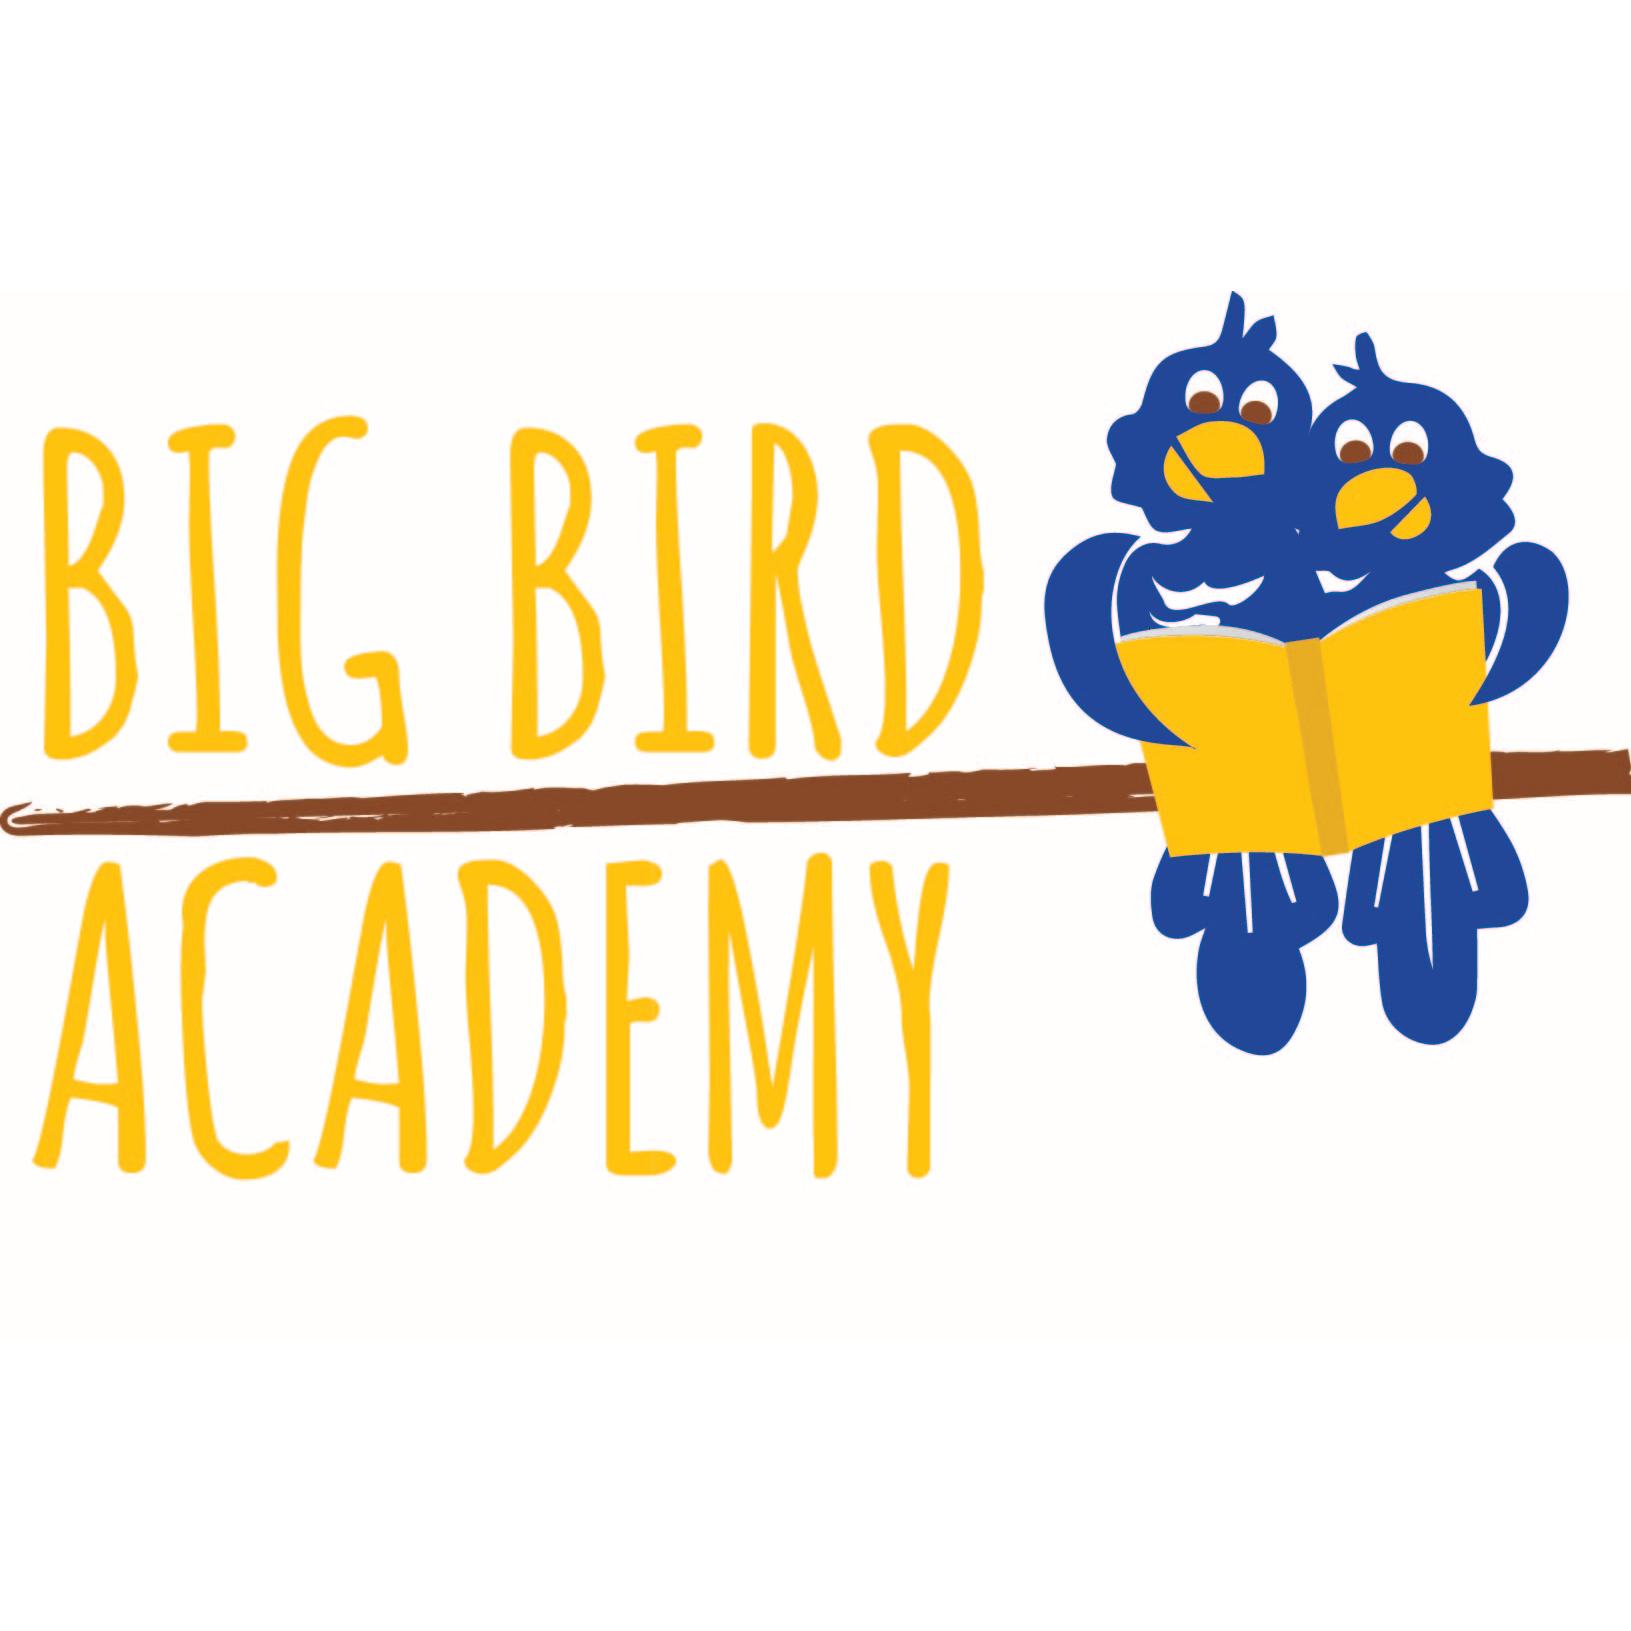 Big Bird Academy